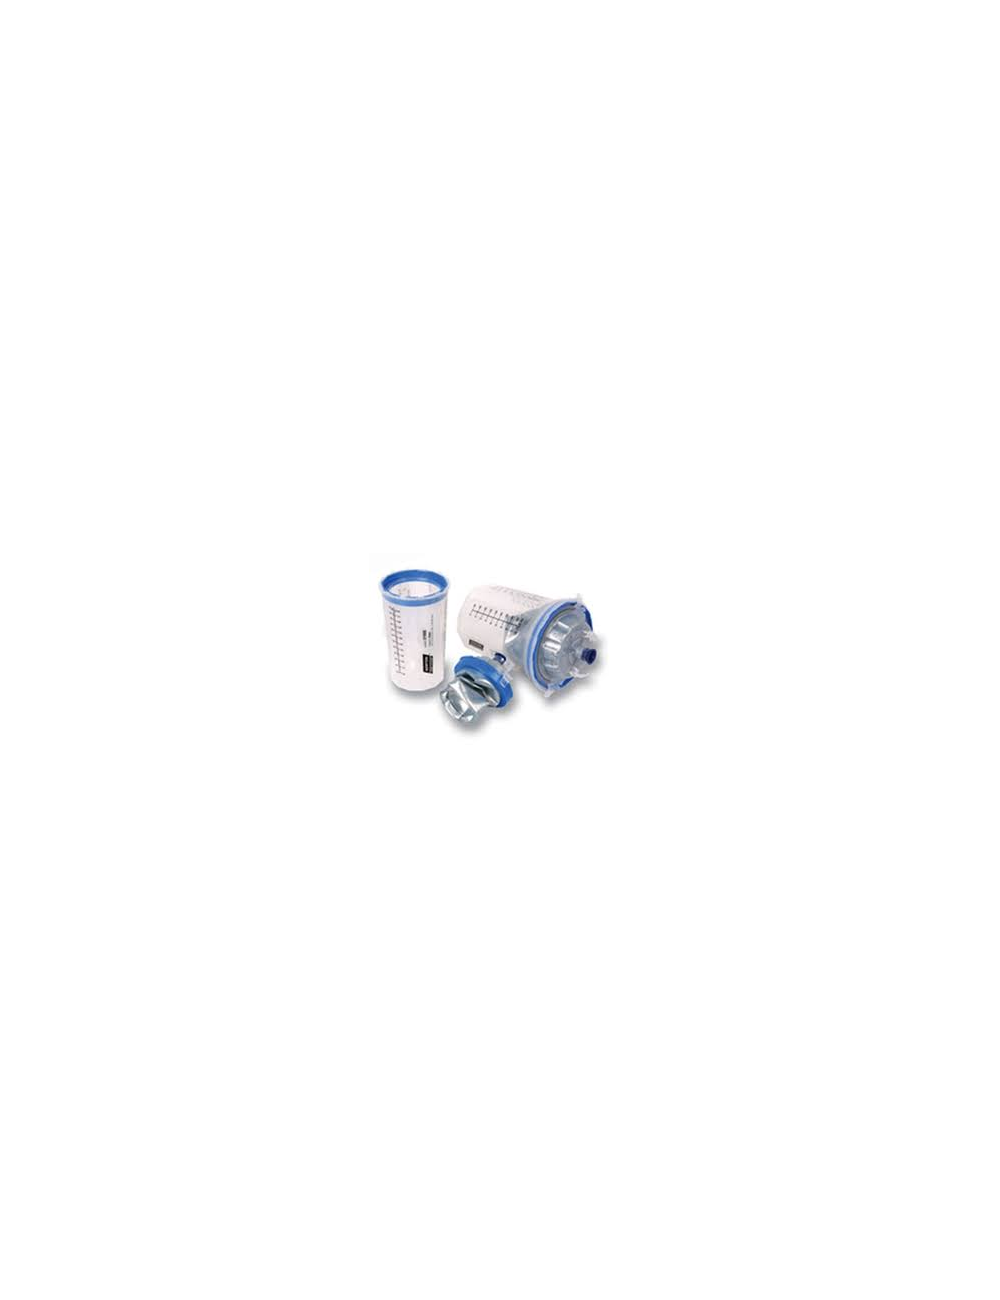 48 NEW GPS Kit medium 750 ml 125 µ